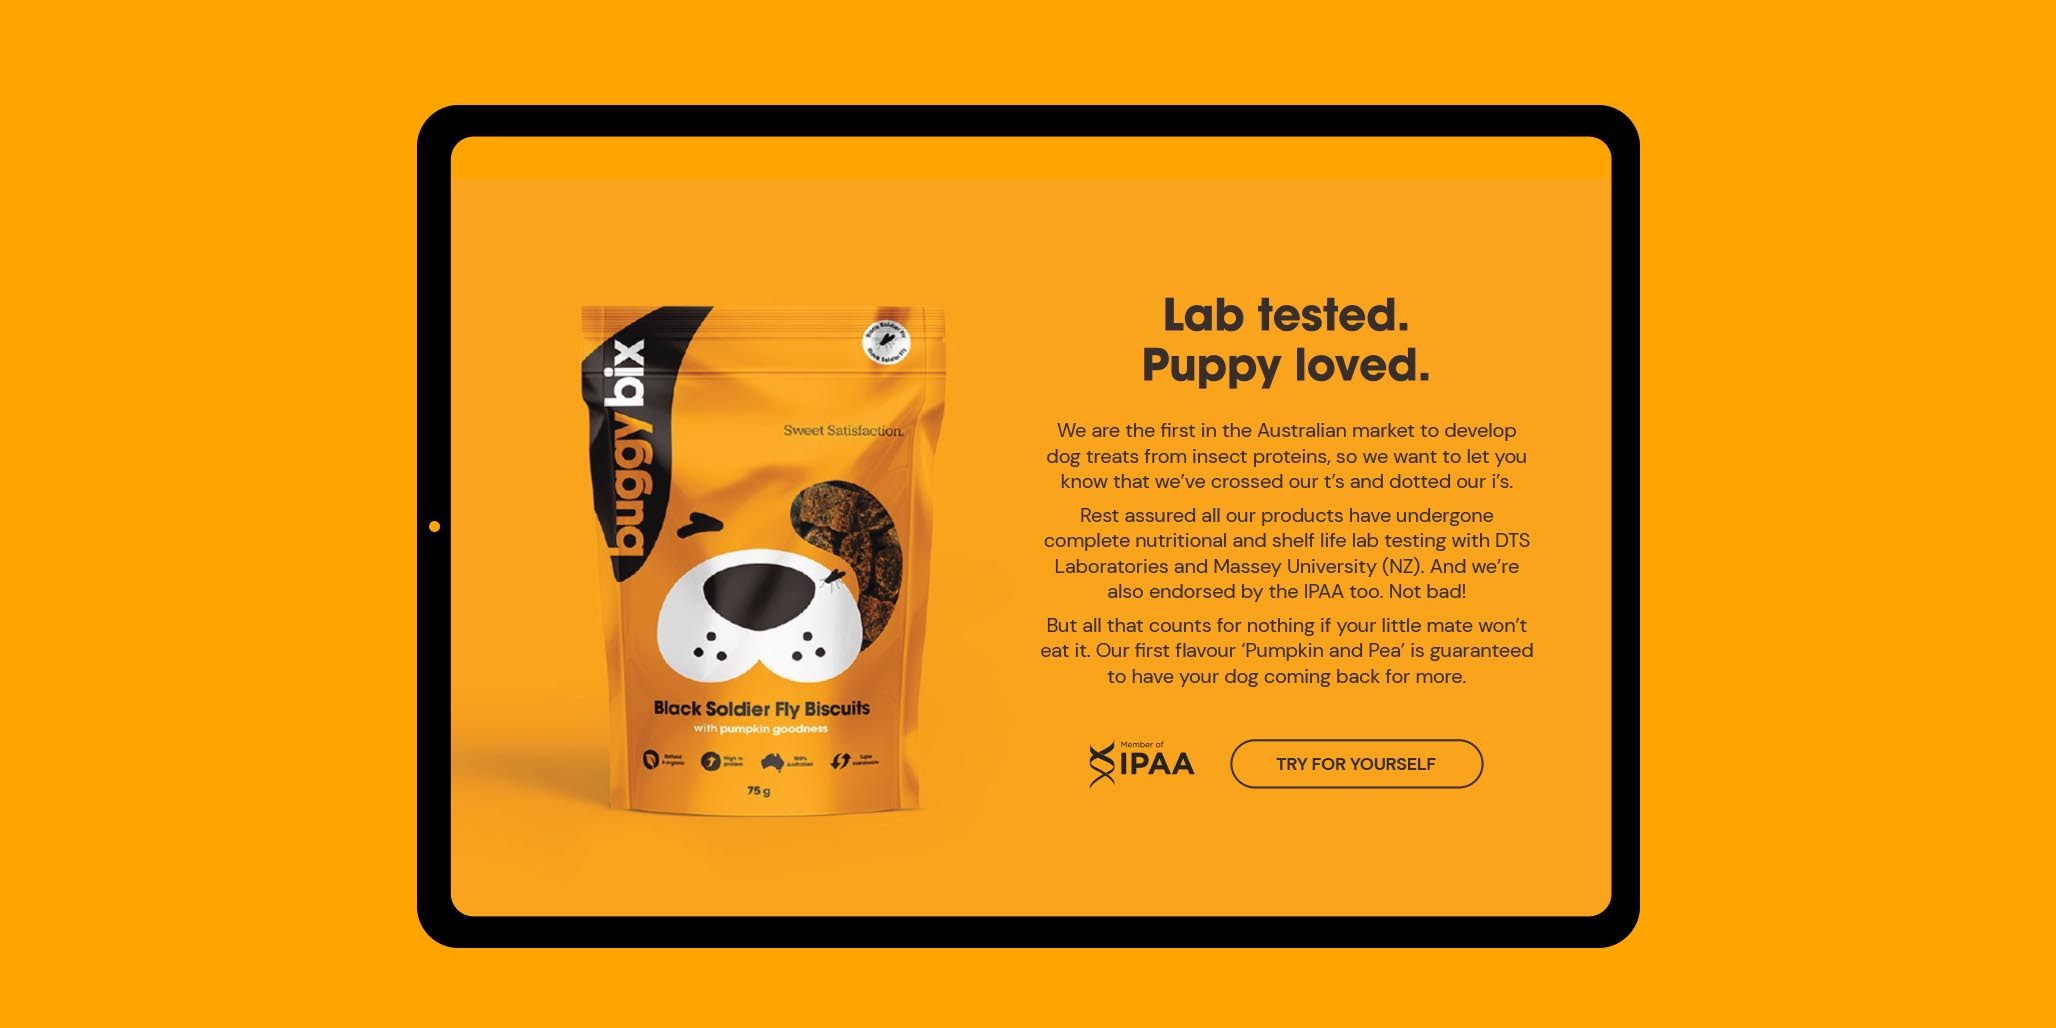 Website Design project image for pet food website design by Percept creative agencies Sydney, case study image C